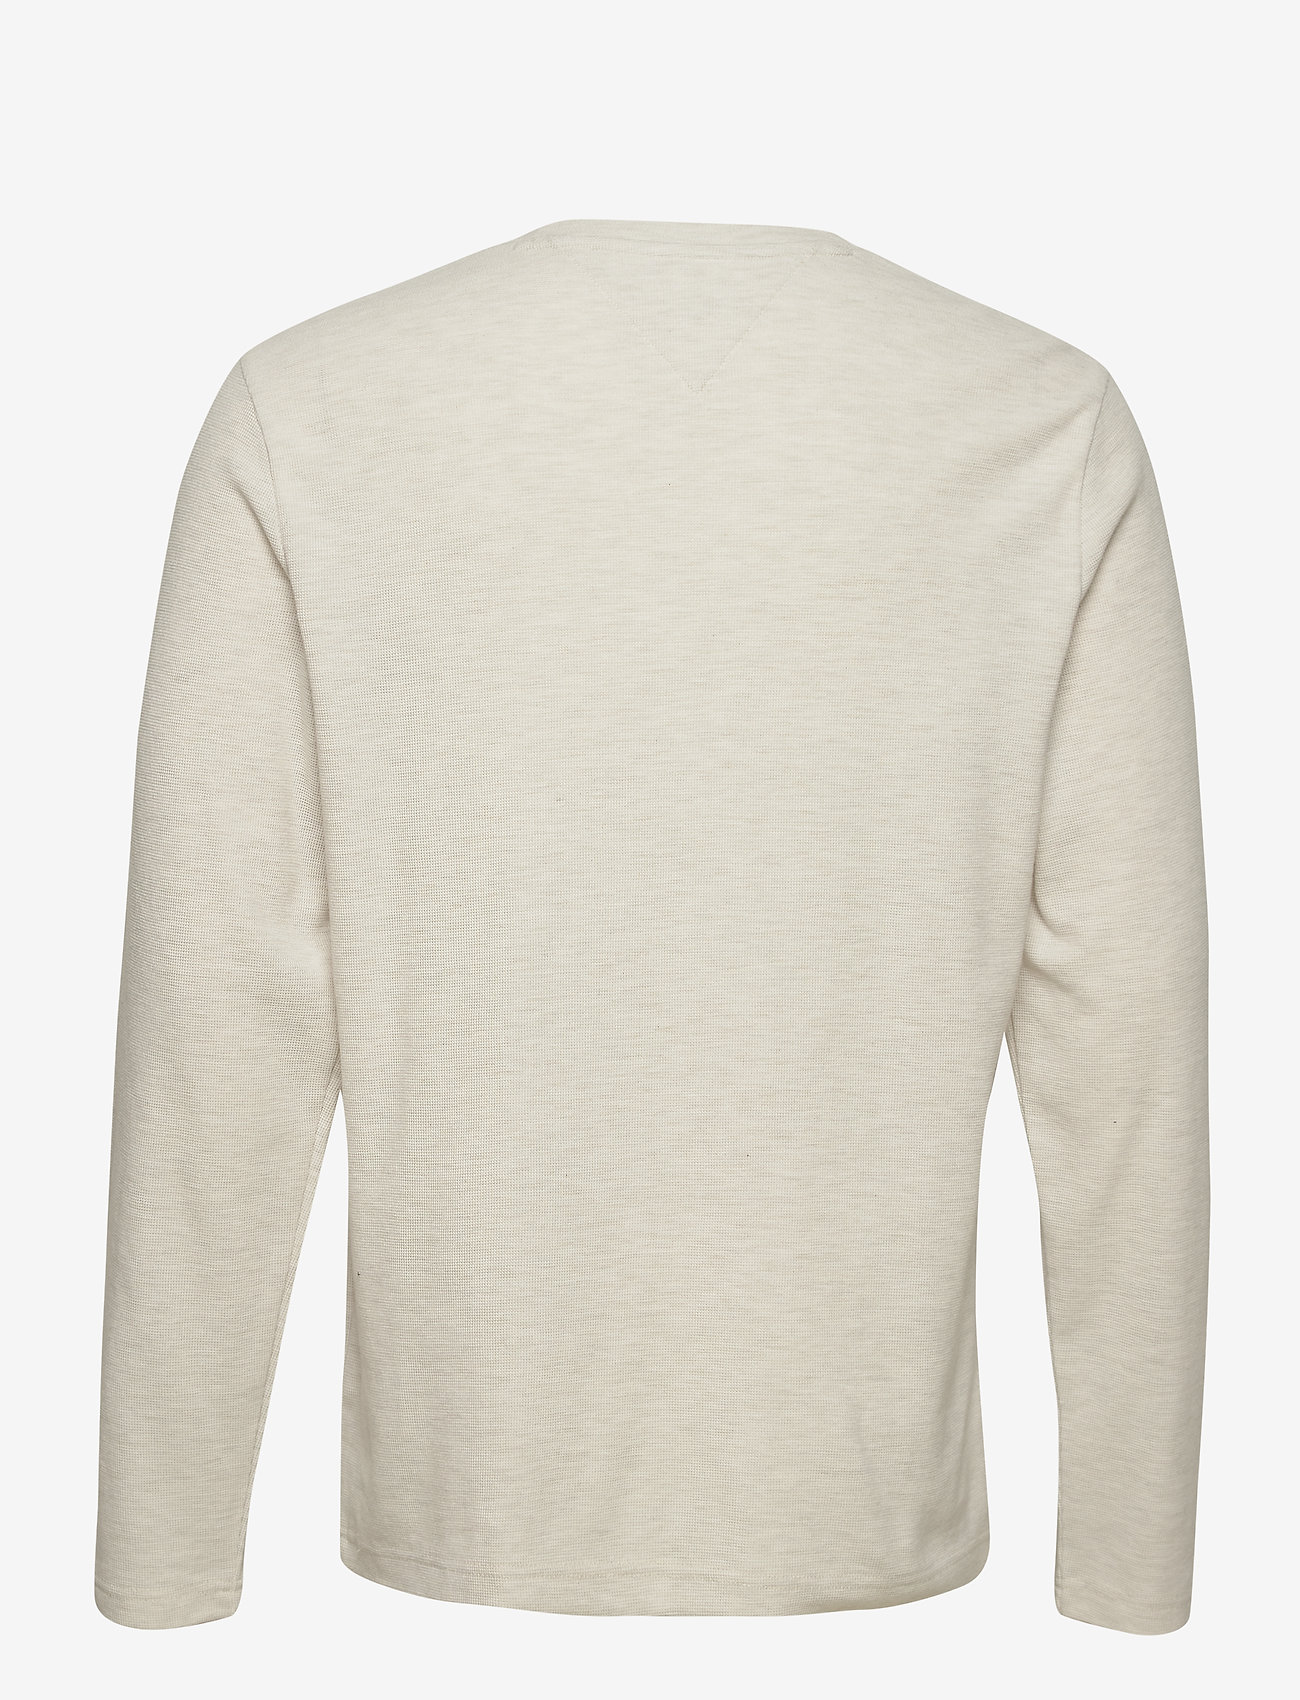 Tommy Jeans - TJM MINI WAFFLE JASPE LONGSLEEVE - basic t-shirts - white htr - 1